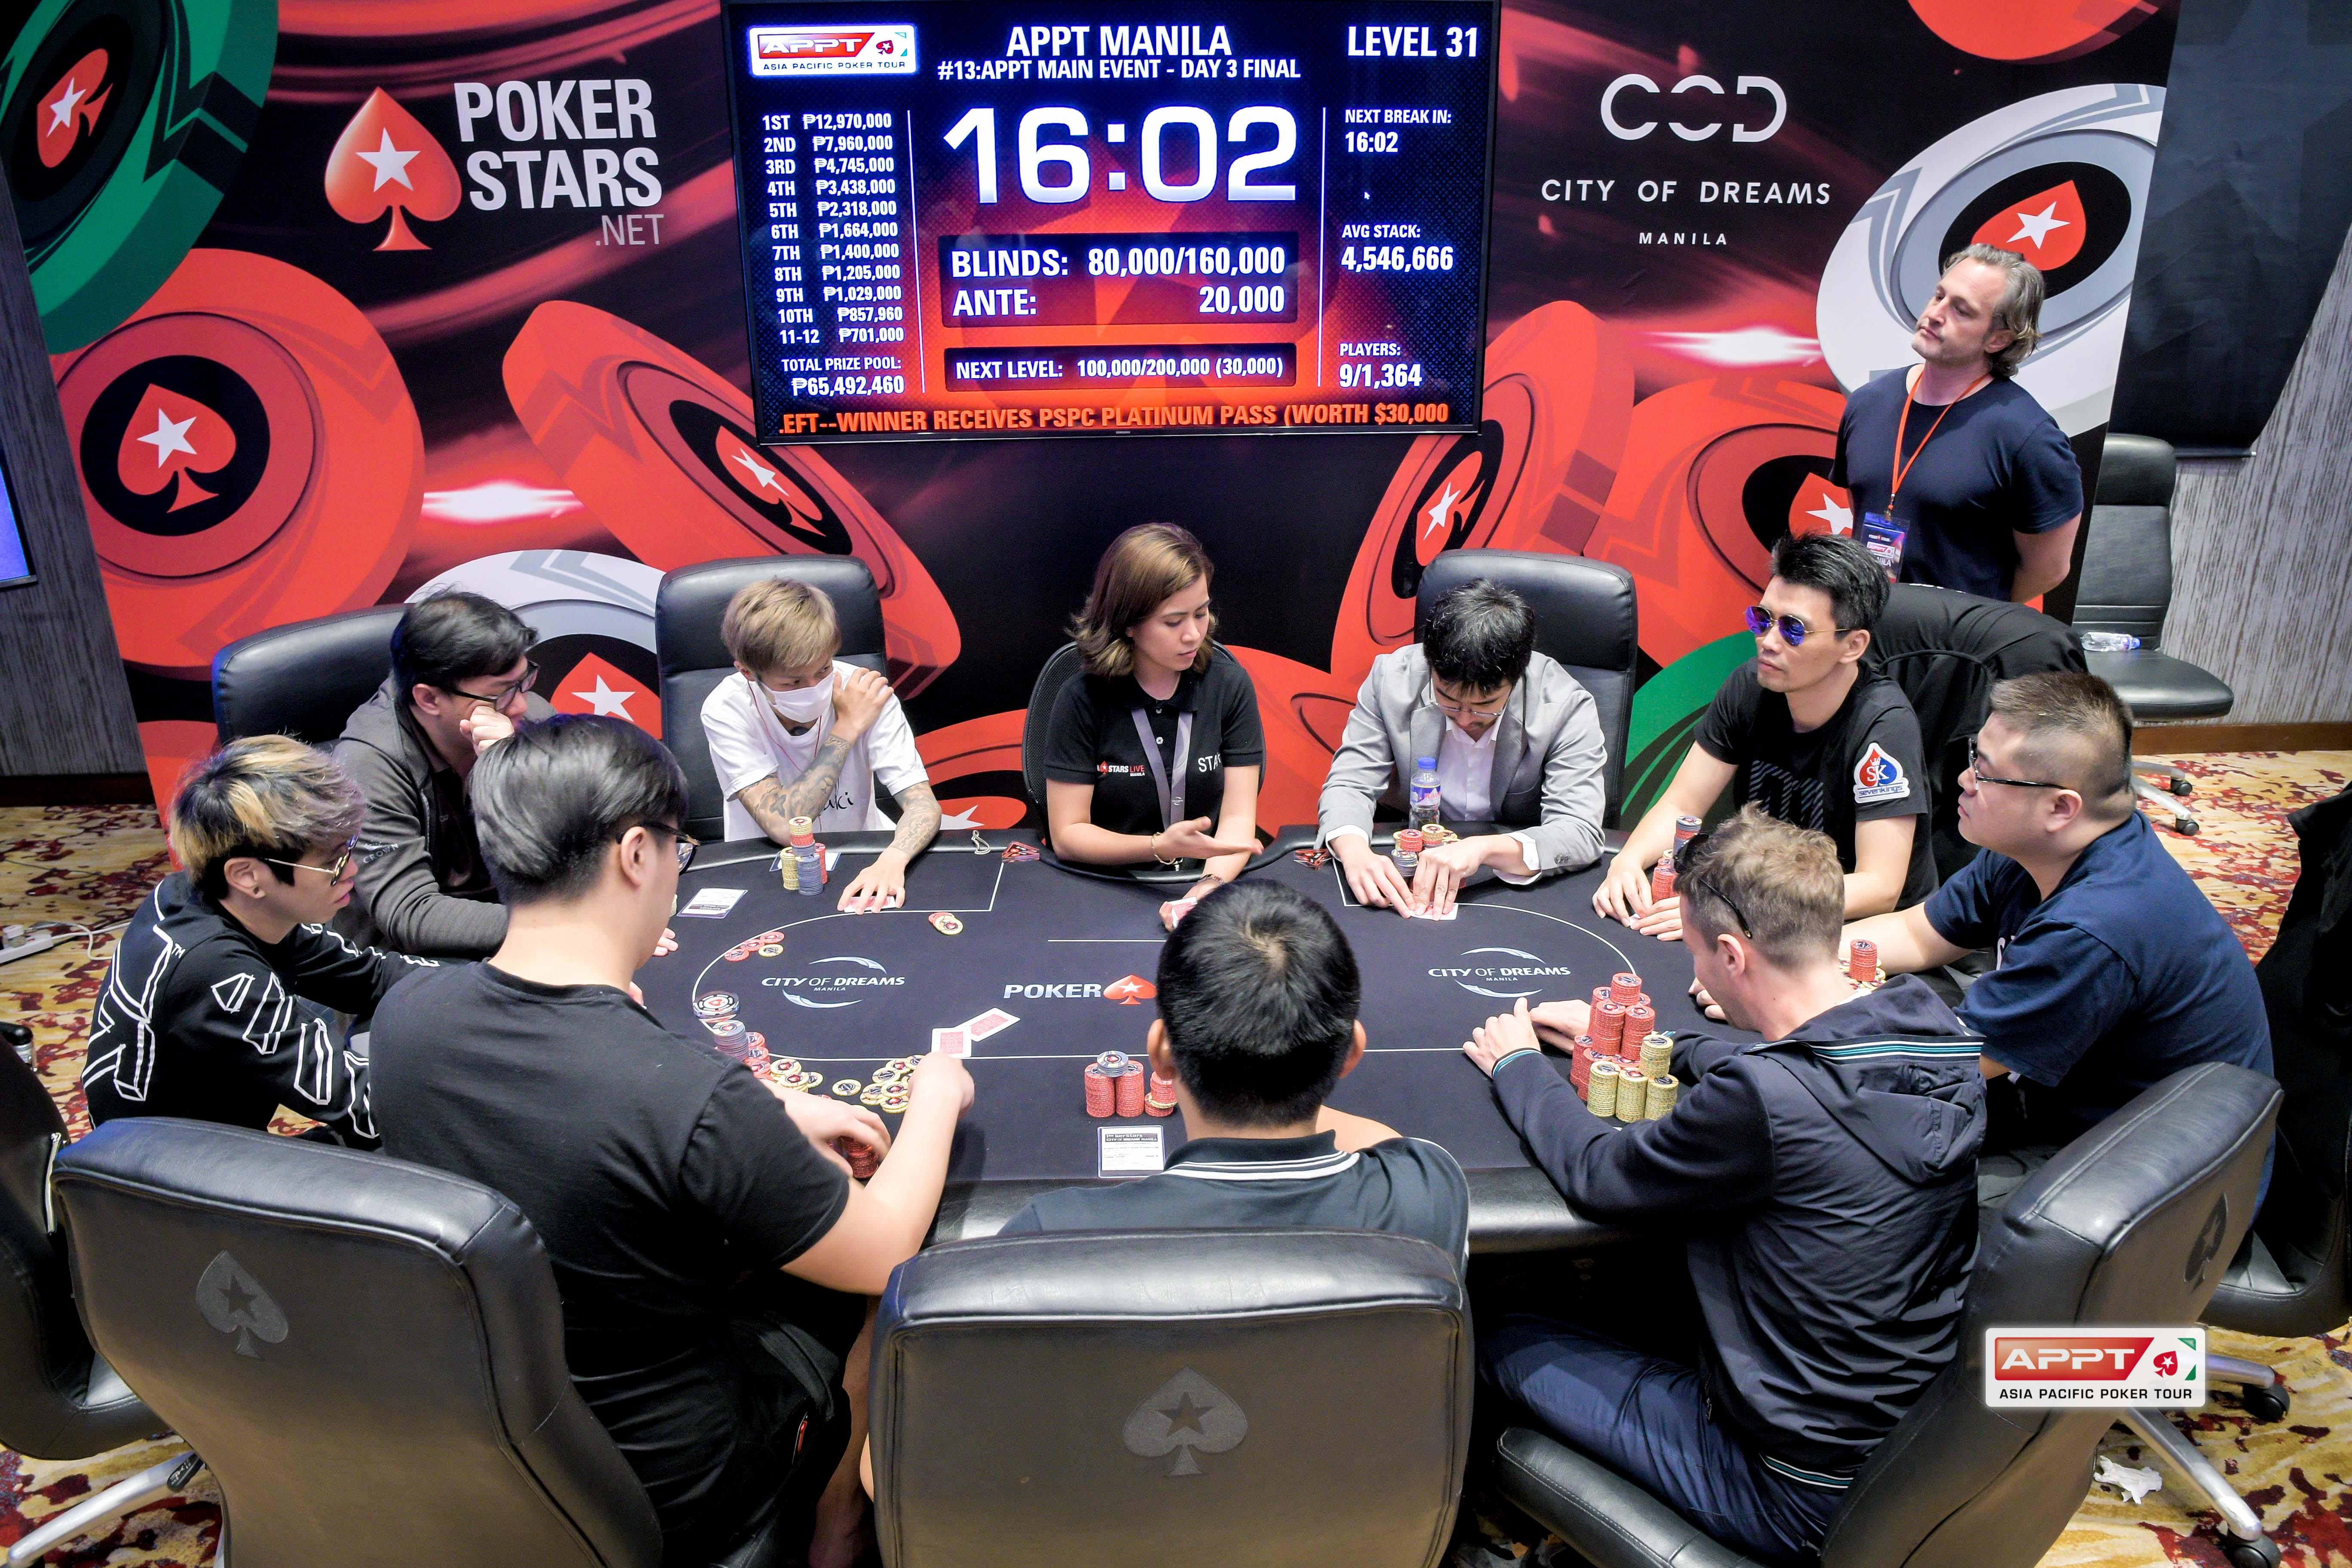 Manila poker betting limits sports betting shreveport casinos